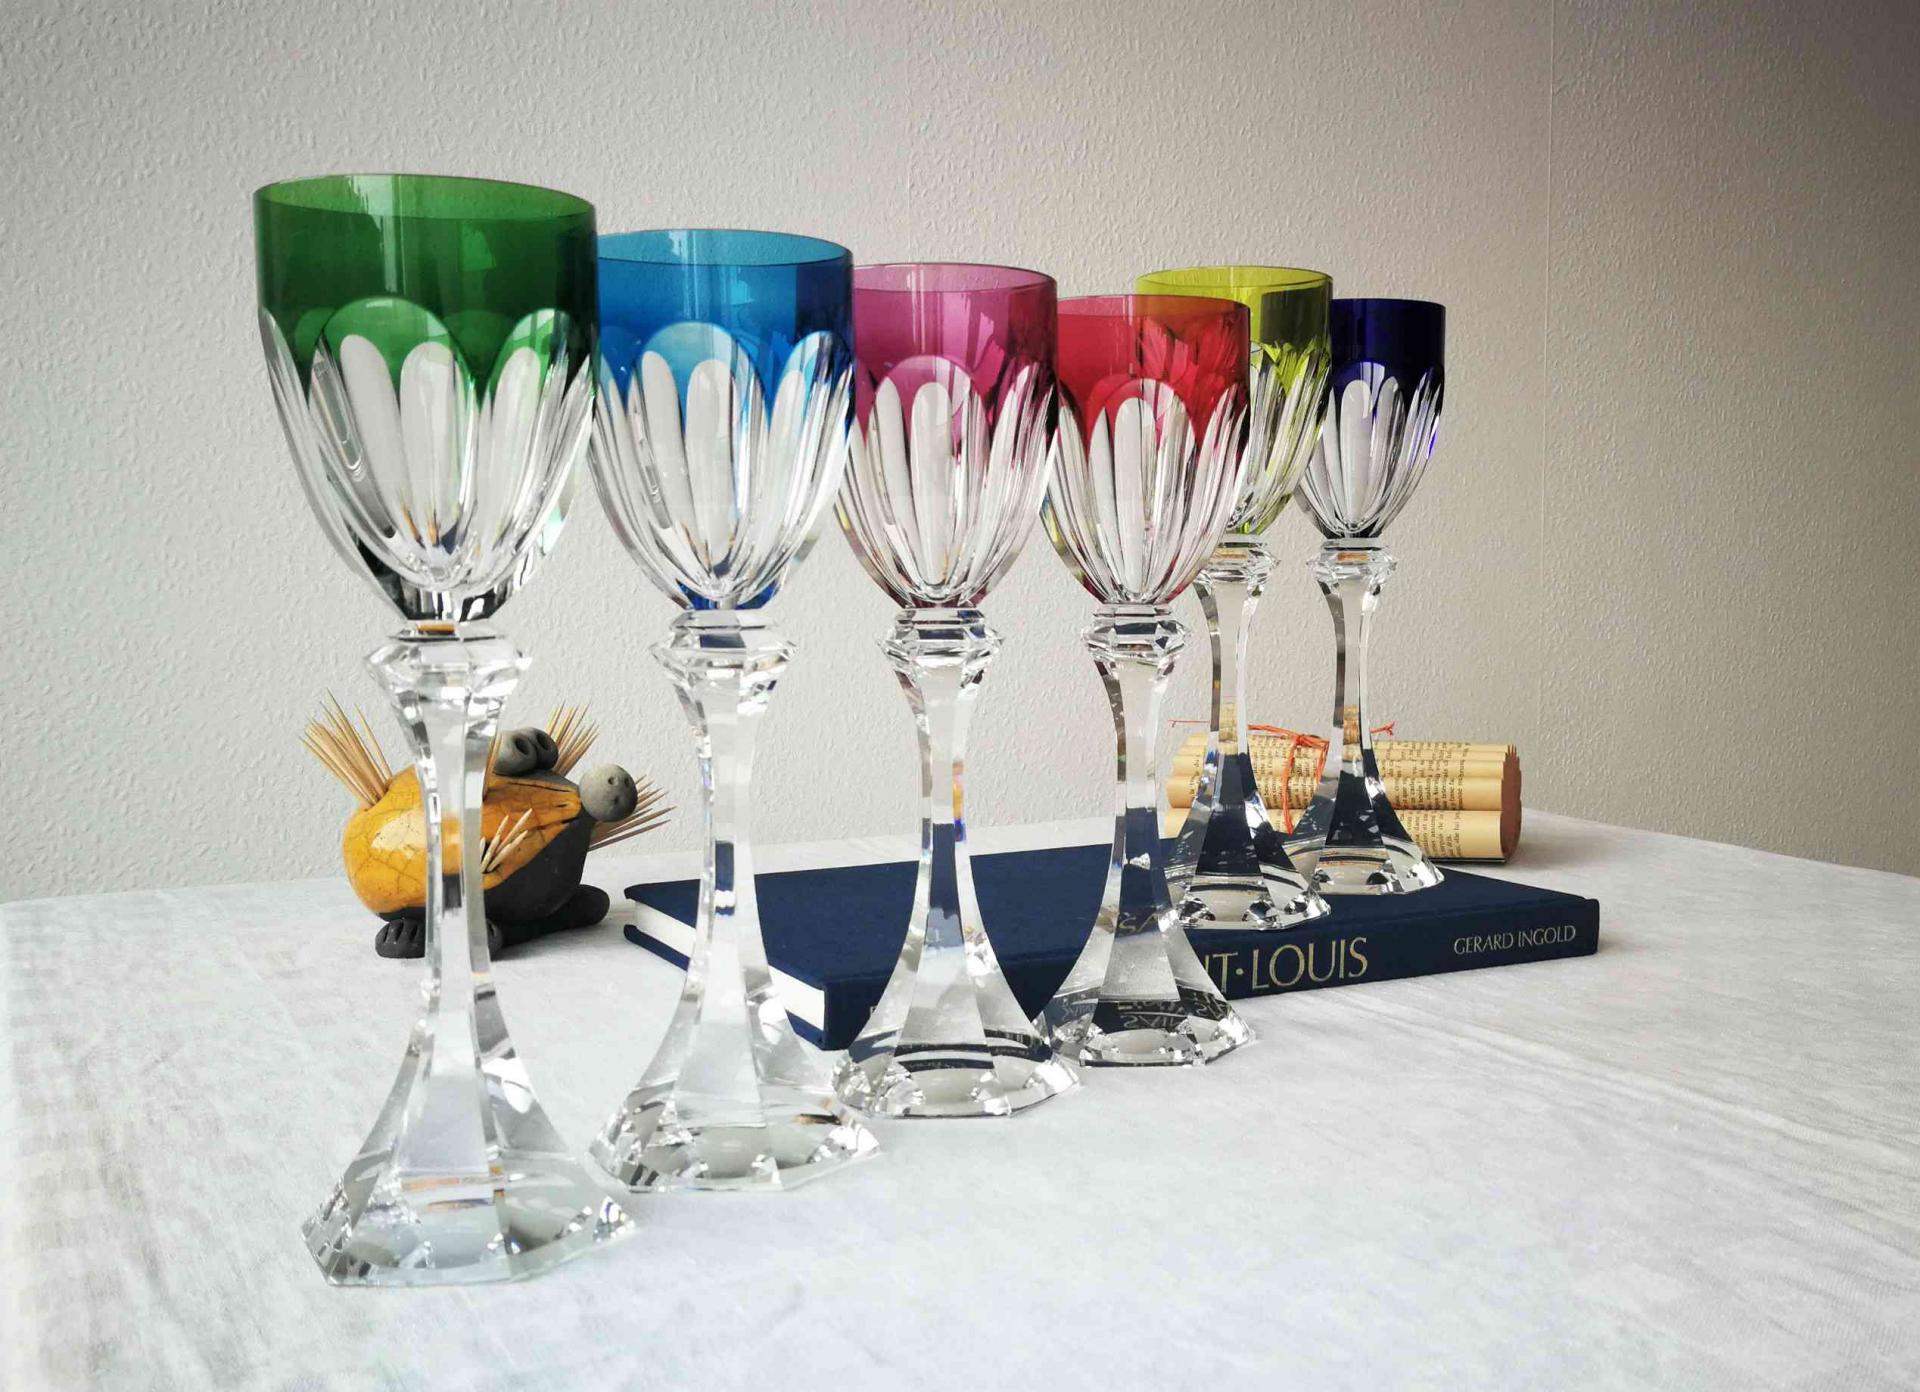 Roemer Chambord, cristallerie Saint Louis